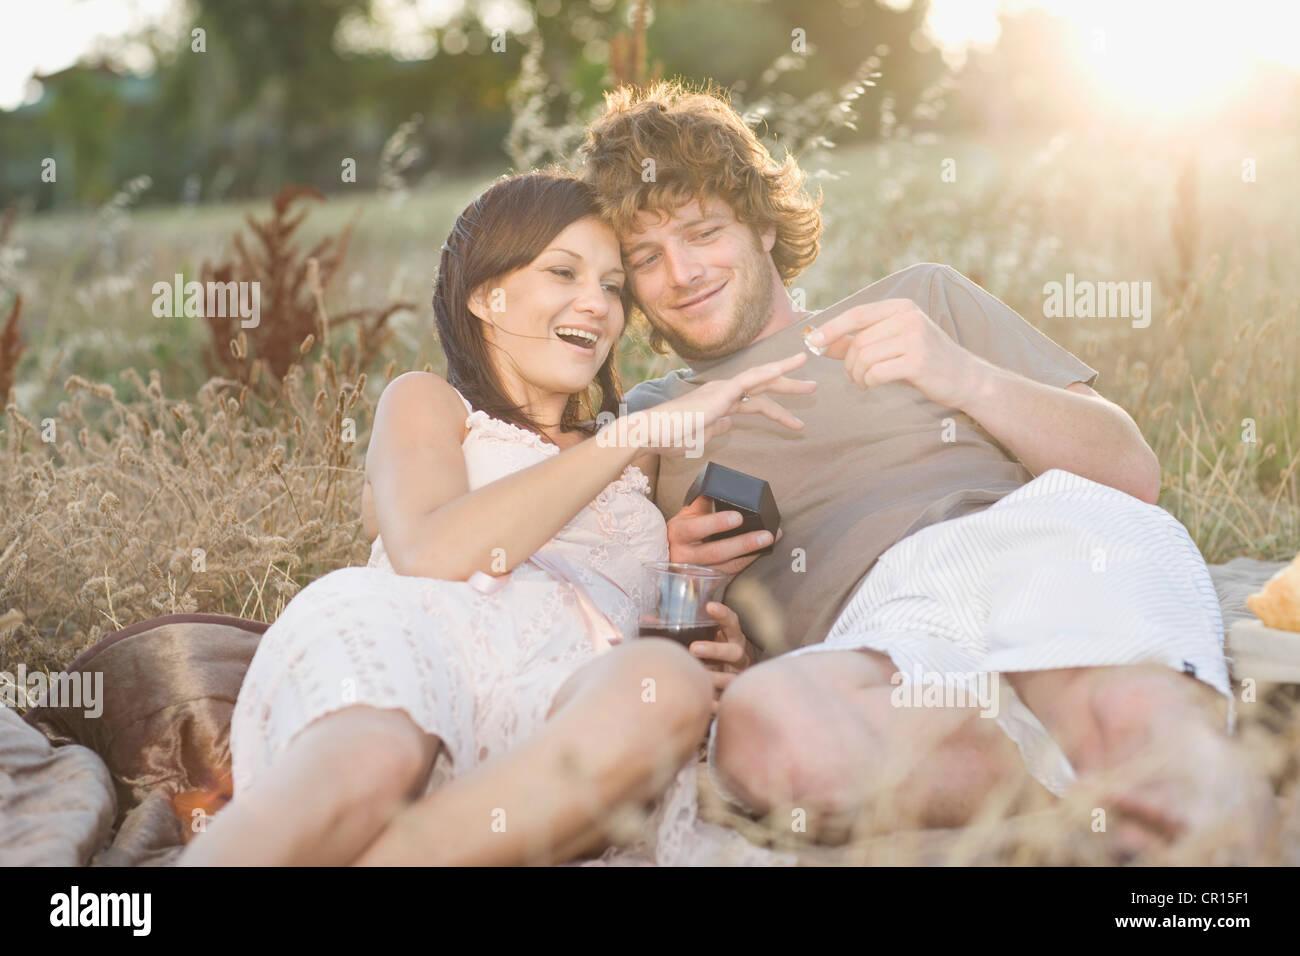 Man proposing to girlfriend at picnic - Stock Image